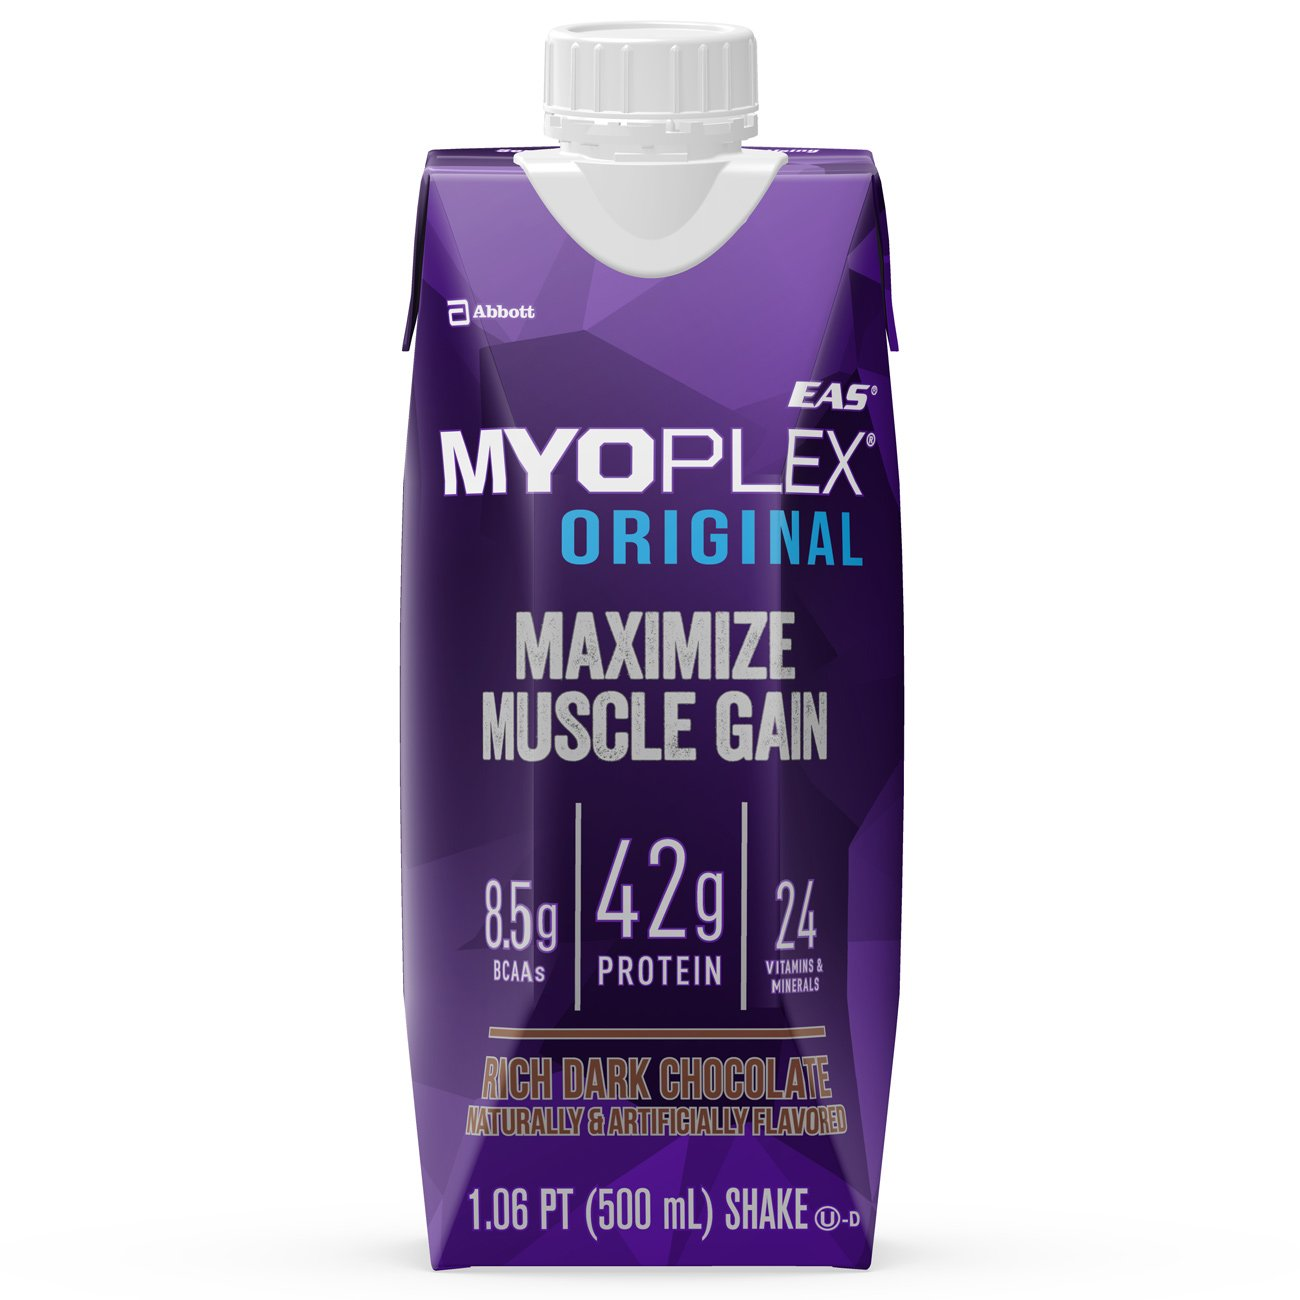 EAS Myoplex Original Ready-To-Drink Protein Shake, Rich Dark Chocolate, 17 oz, 4 count (Pack of 3)